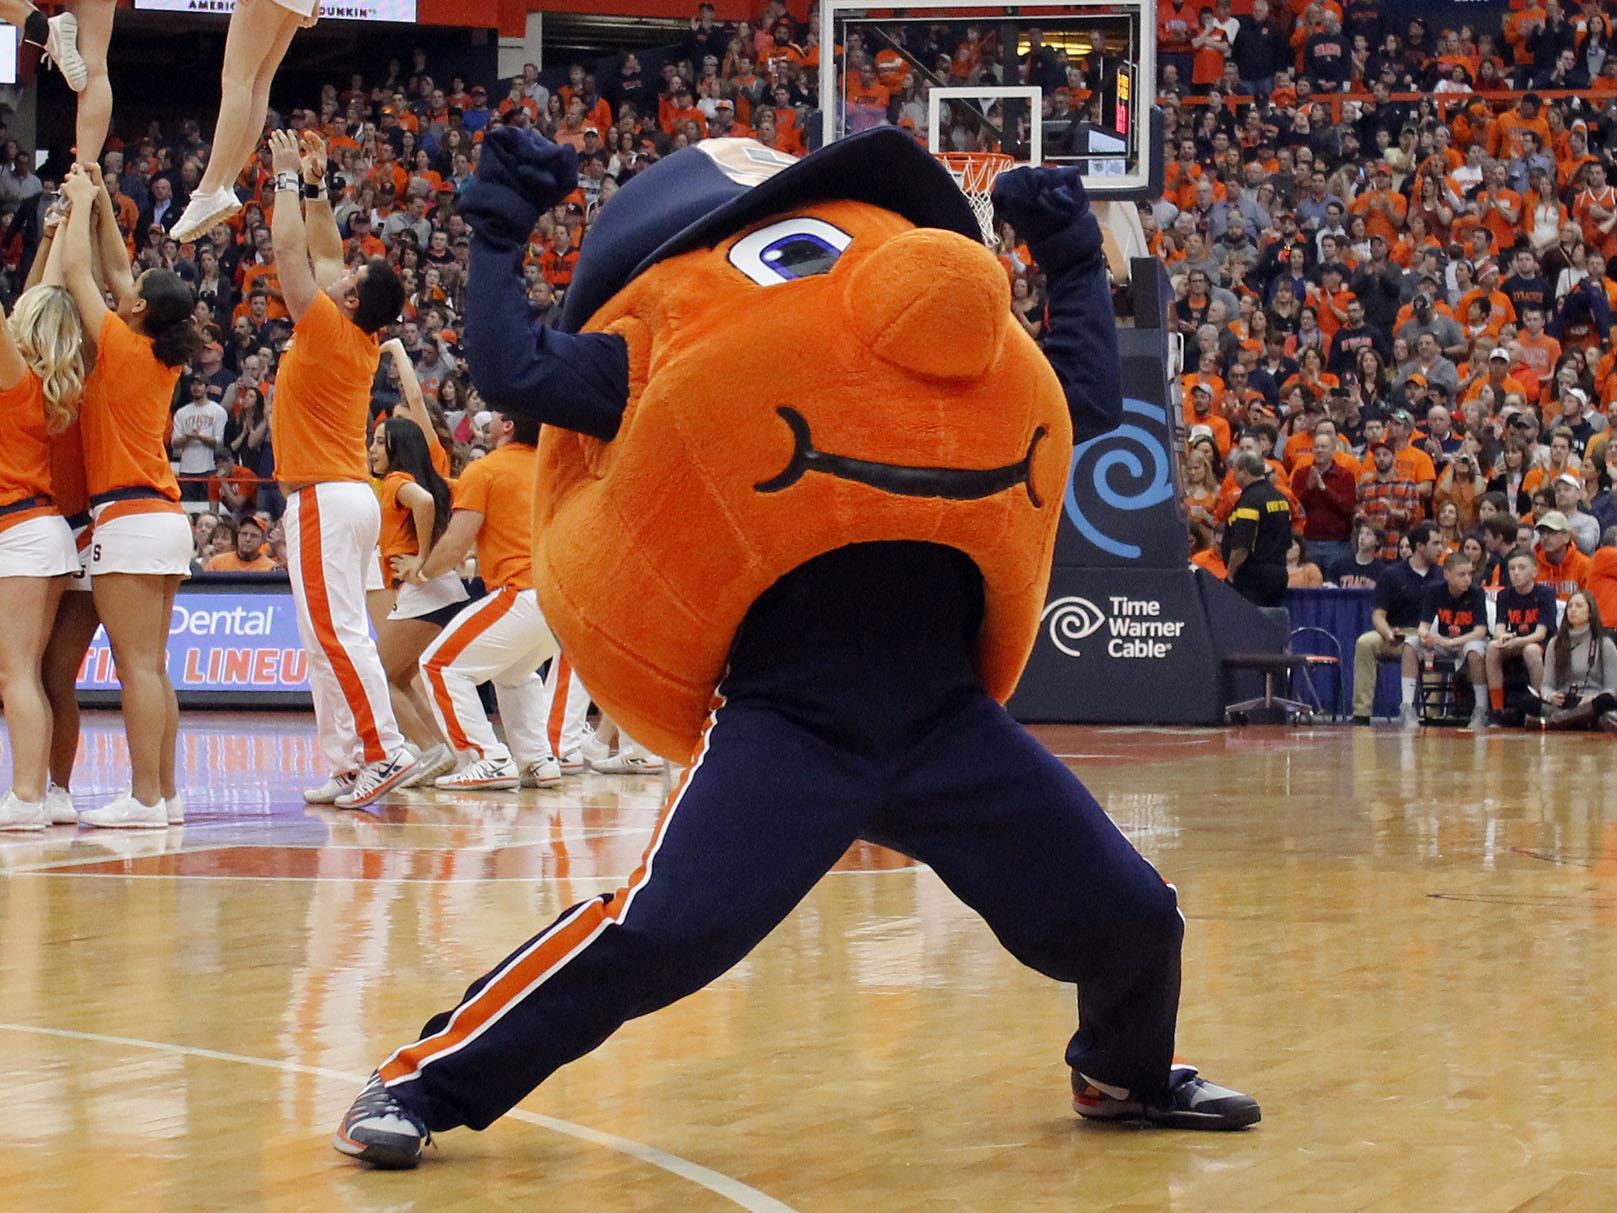 Otto the Orange, members of the Syracuse University cheerling team